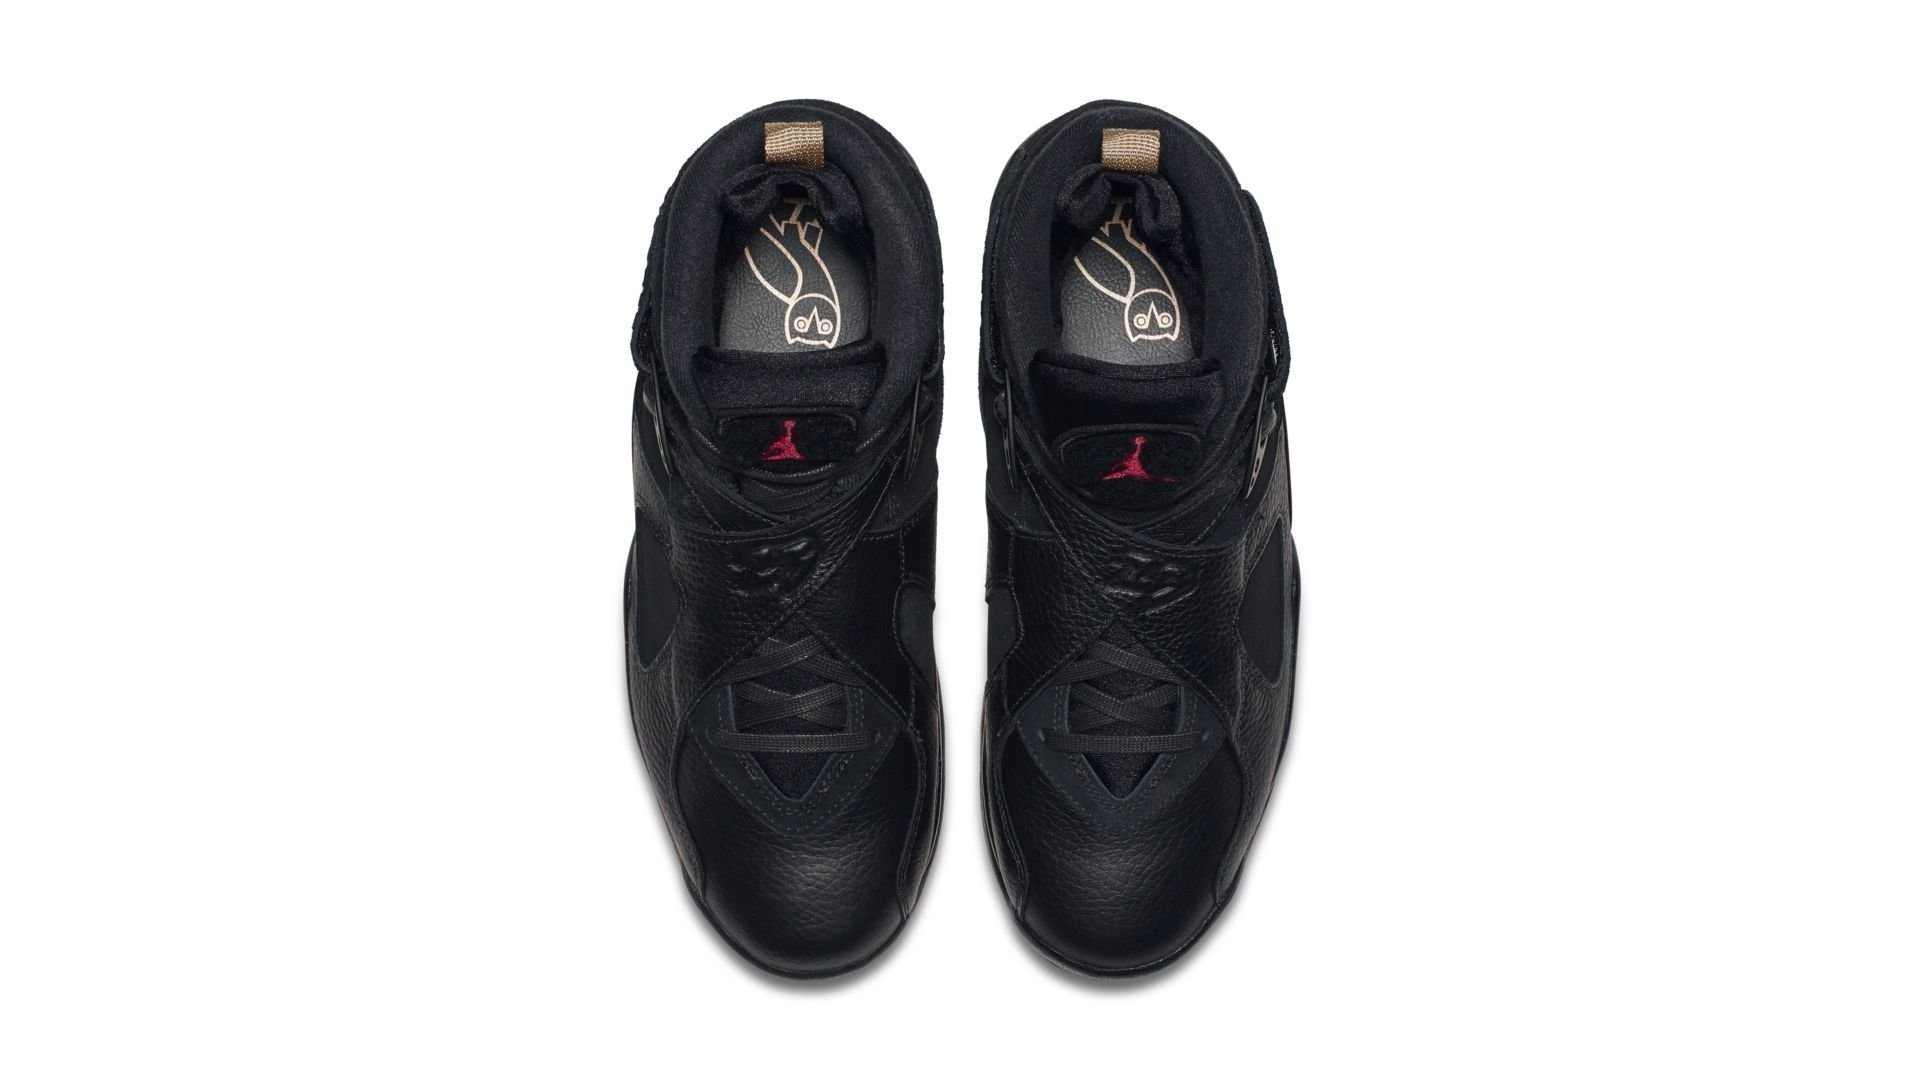 Jordan 8 Retro OVO Black (AA1239-045)